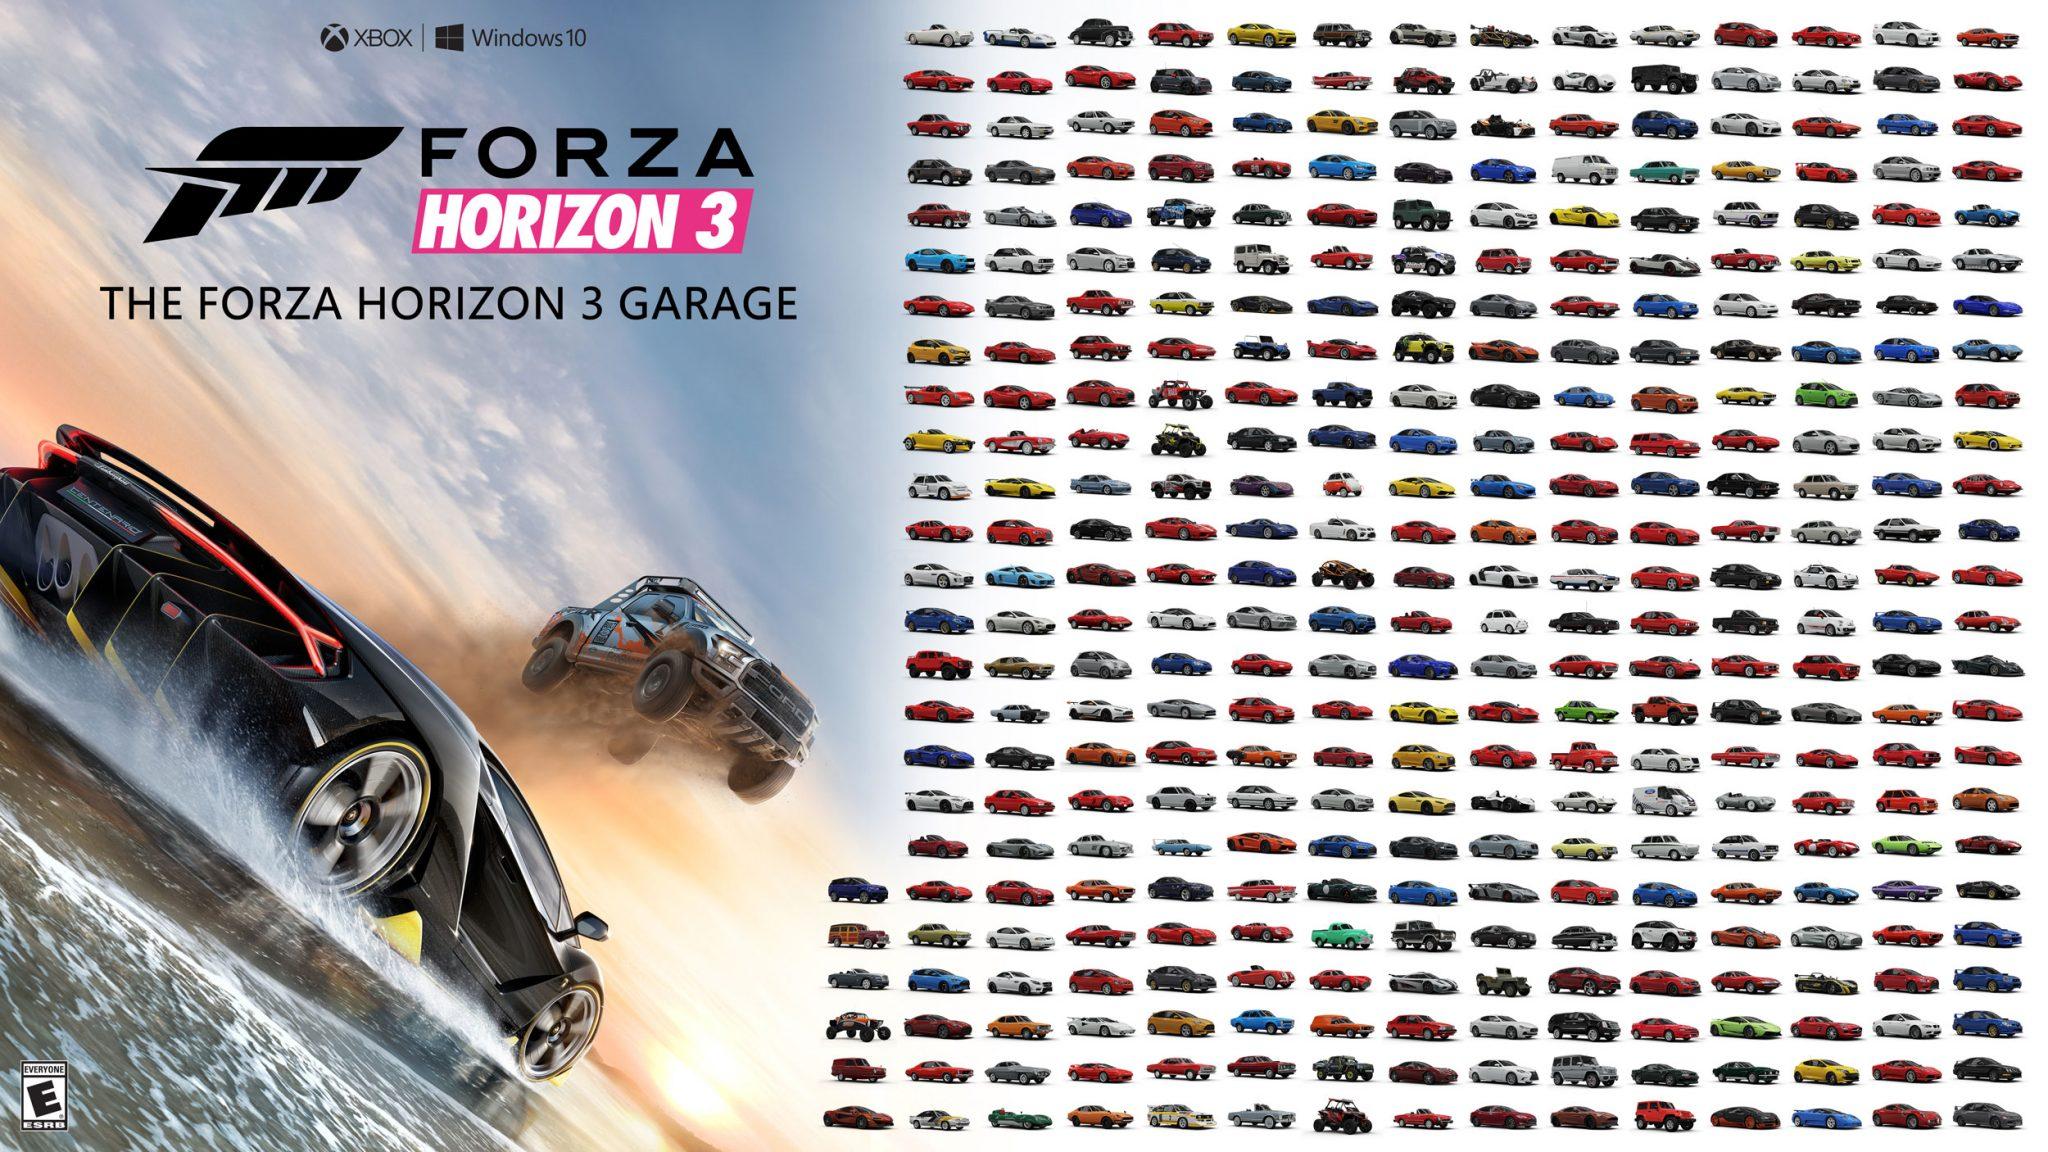 Forza Horizon 3 todos los coches